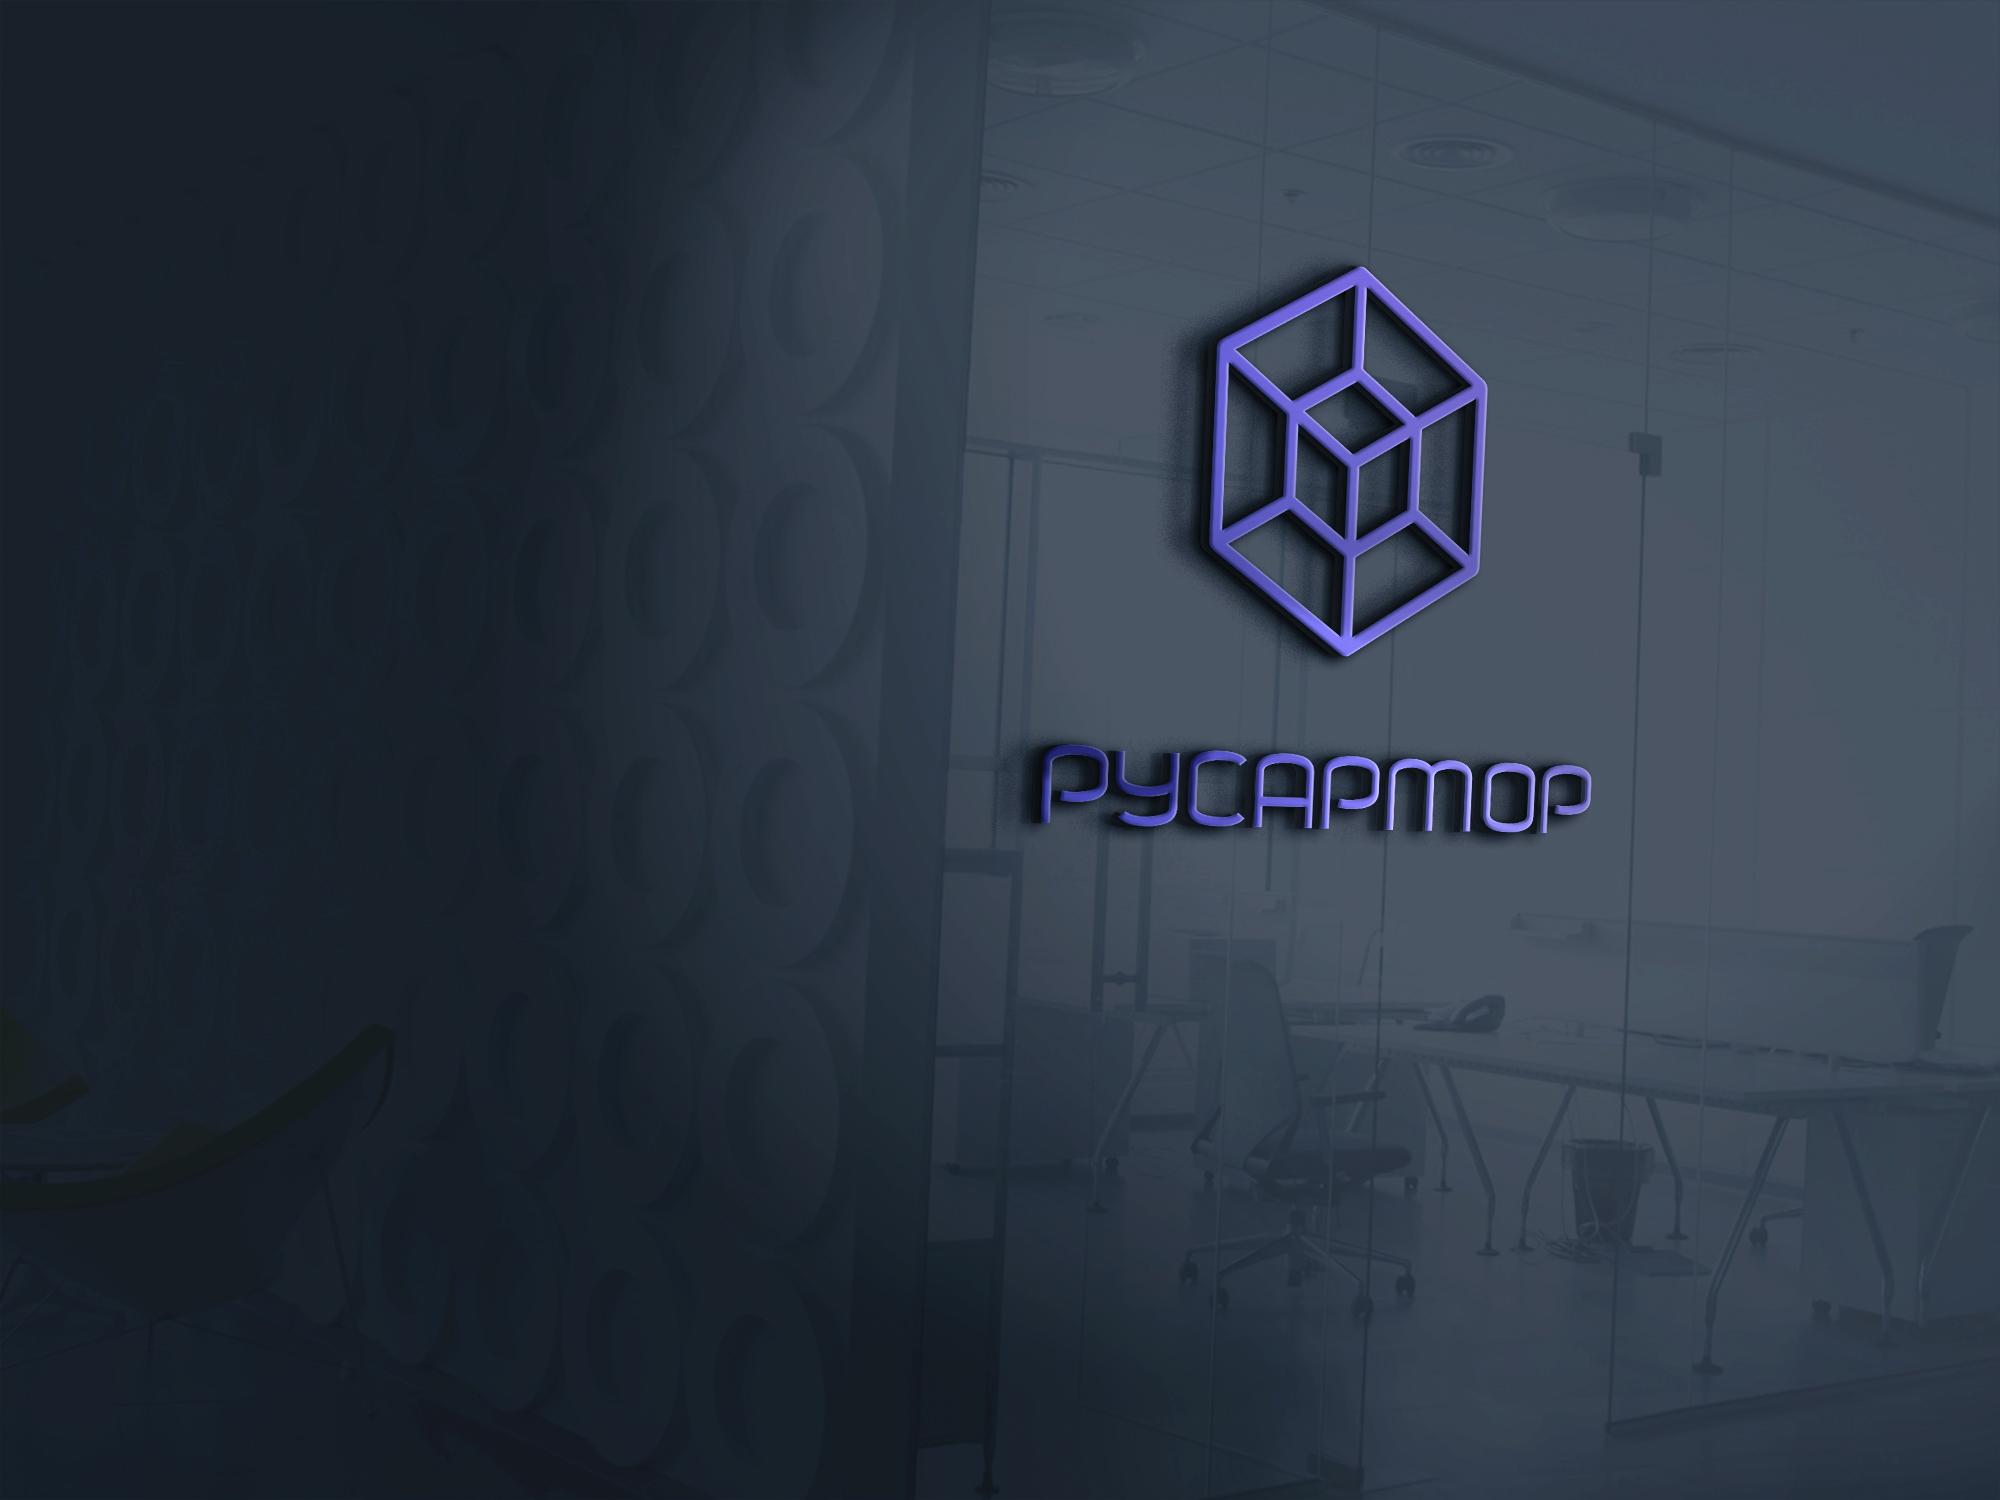 Разработка логотипа технологического стартапа РУСАРМОР фото f_7085a0809db7b9a2.jpg